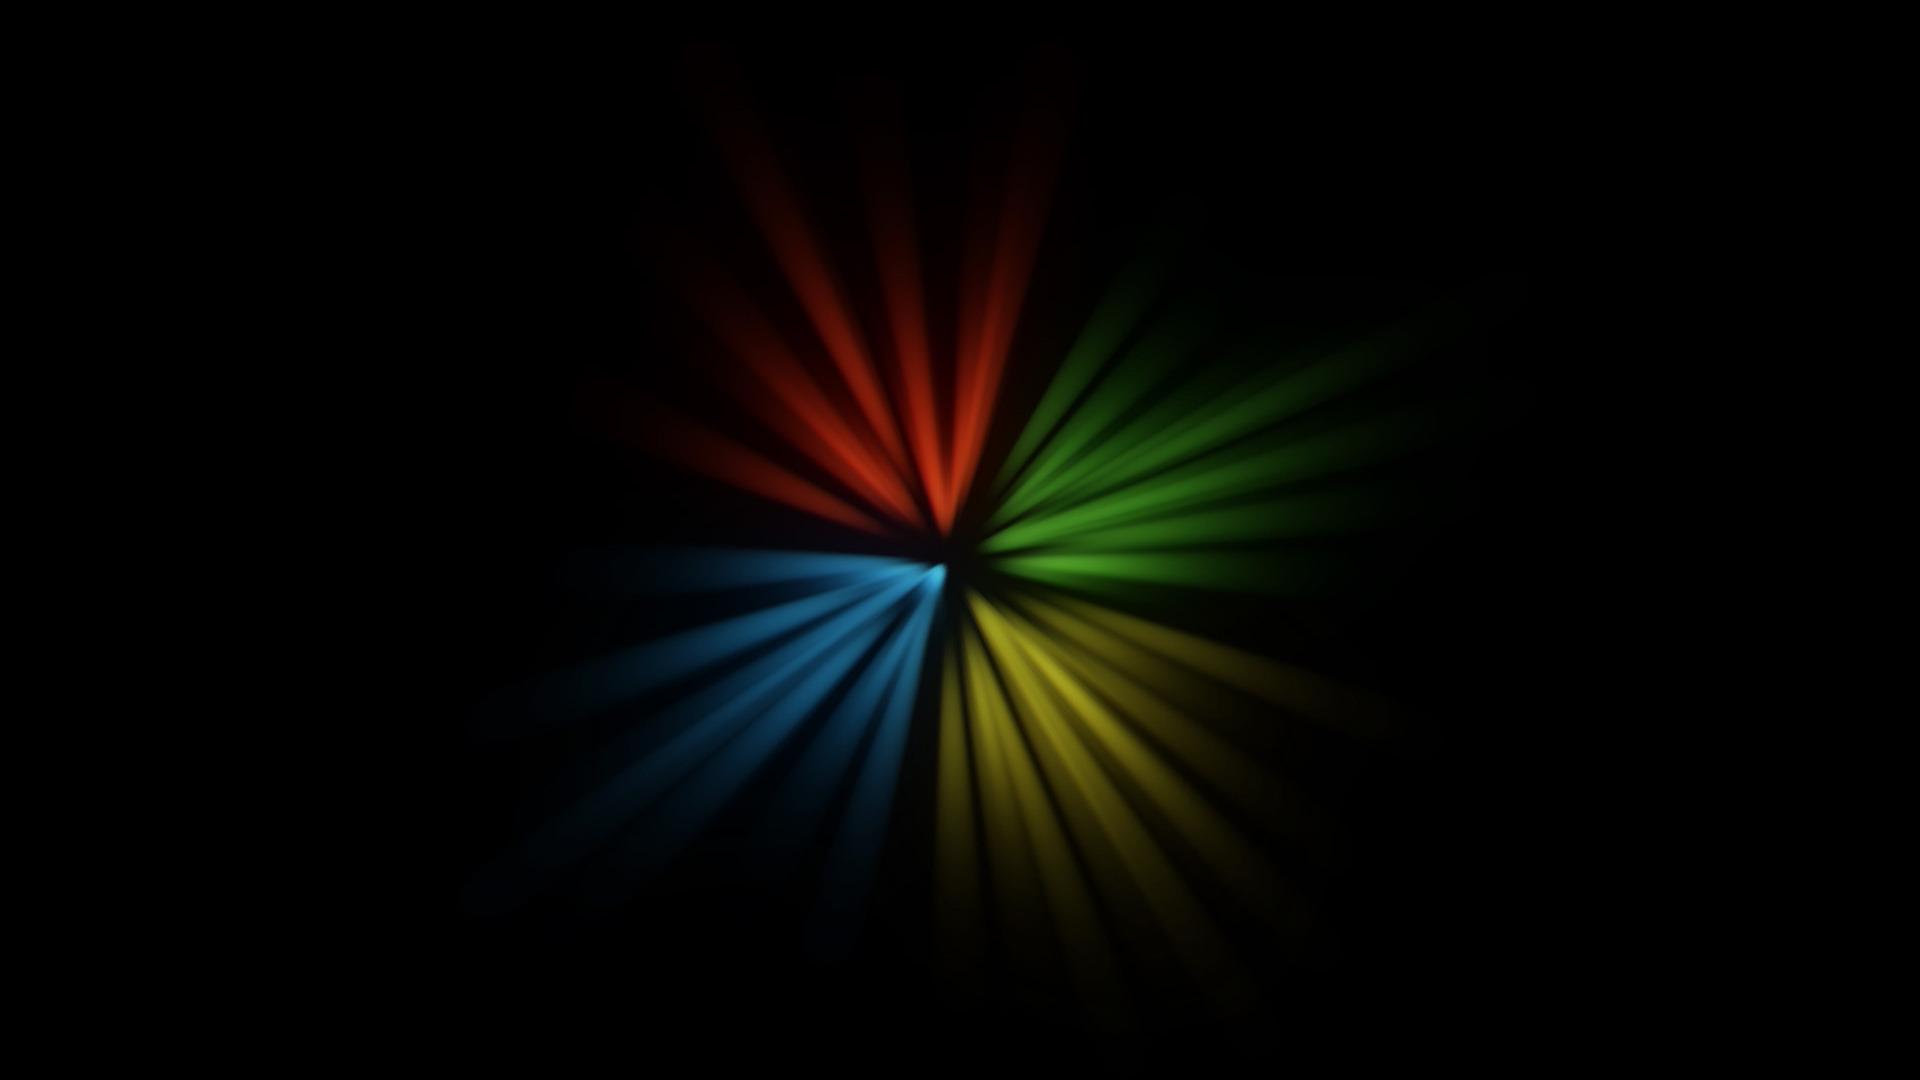 Windows Logo 3d art abstract black blue green red yellow 1920x1080